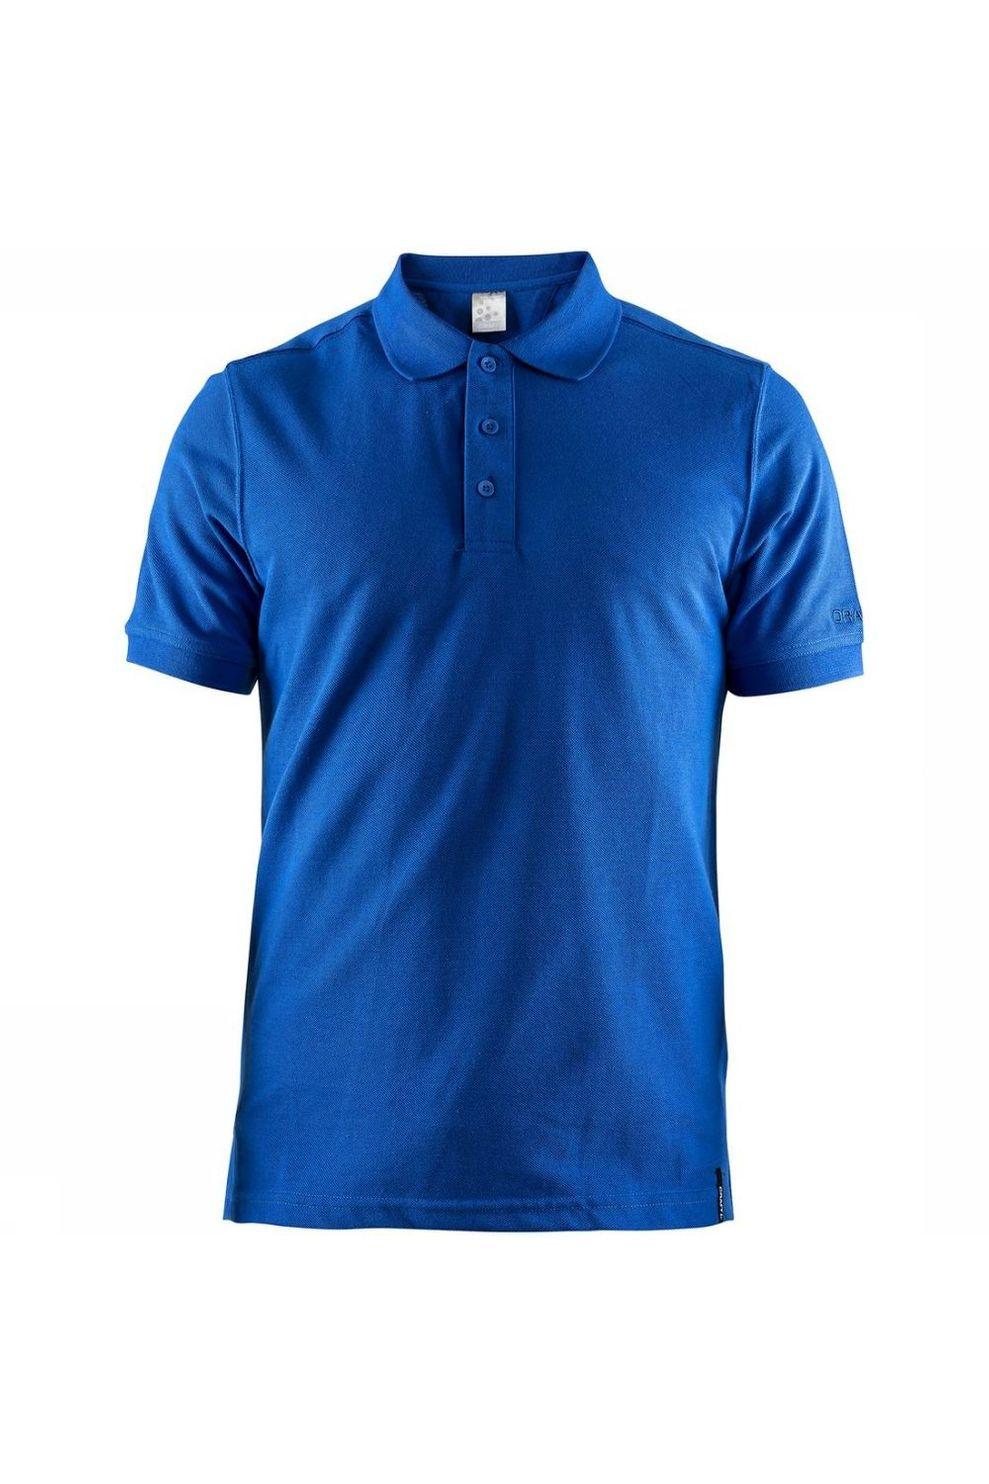 Craft Polo Casual Polo Pique voor heren - Blauw - Maten: S, M, L, XL, XXL, XXXL, XXXXL